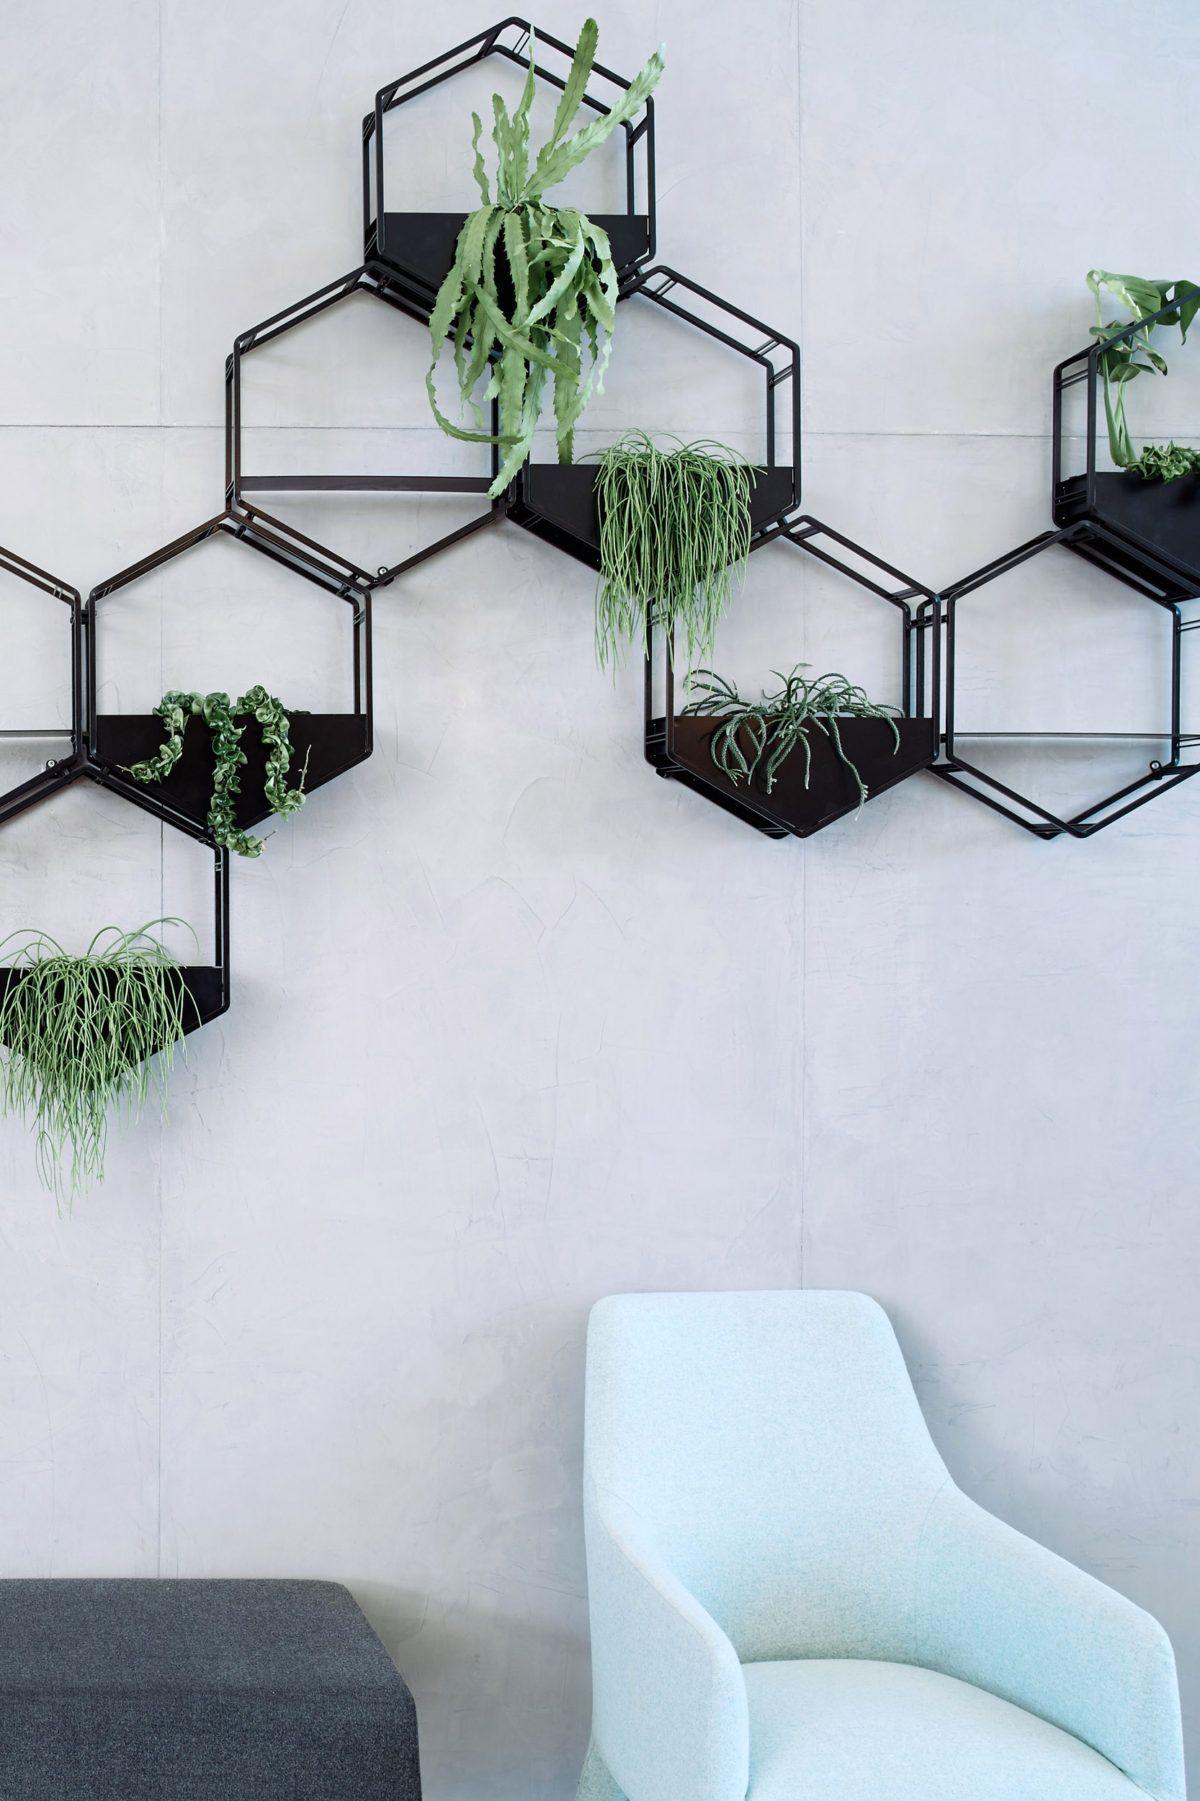 Wabe Wall Planter Oblica Melbourne Modern Designer Fireplaces Wall Planters Indoor Wall Planter Metal Wall Planters